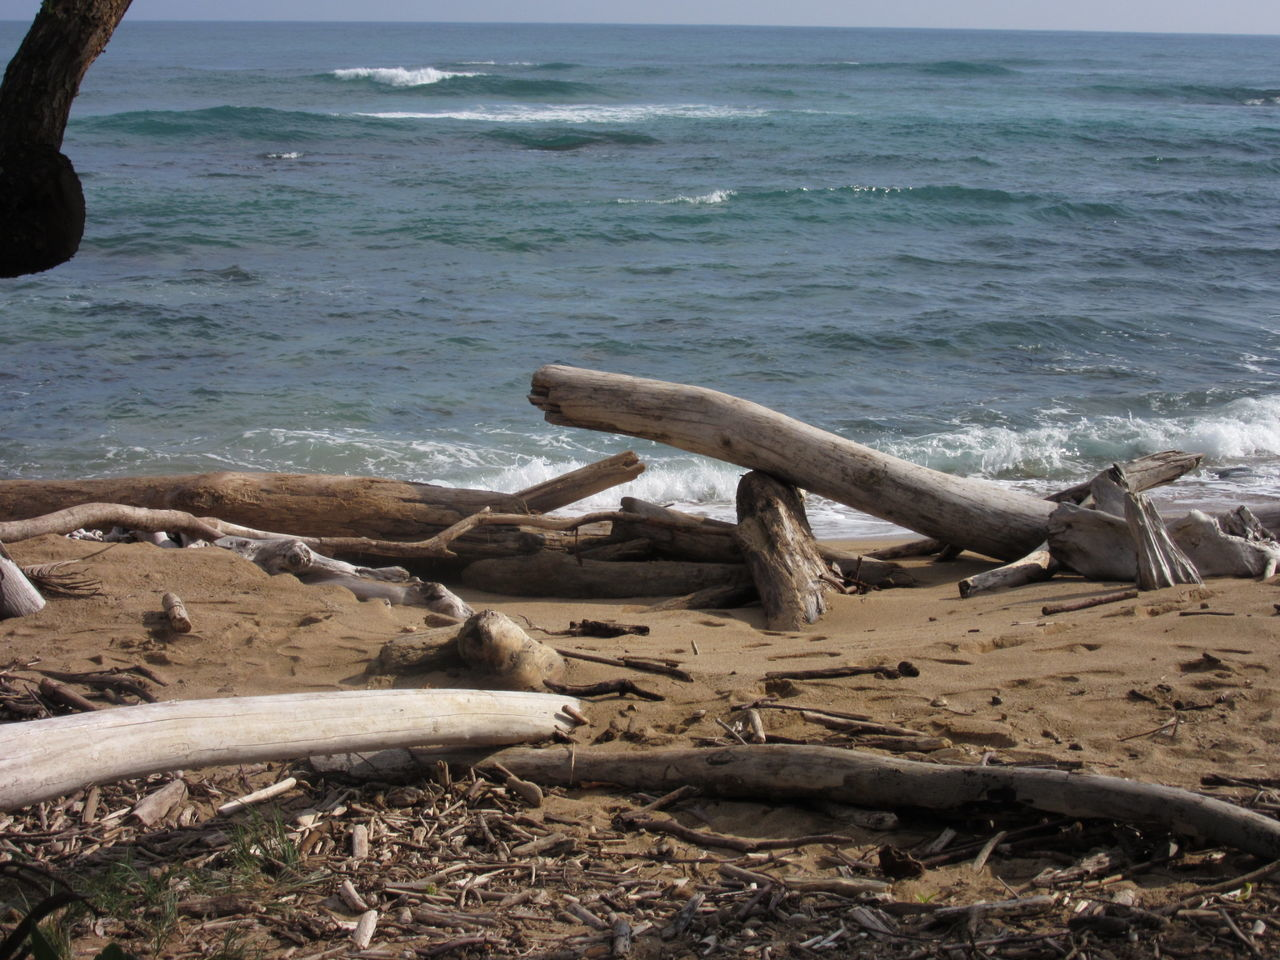 Water Sea Nature Kauai Hawaii Outdoors Sand Driftwood